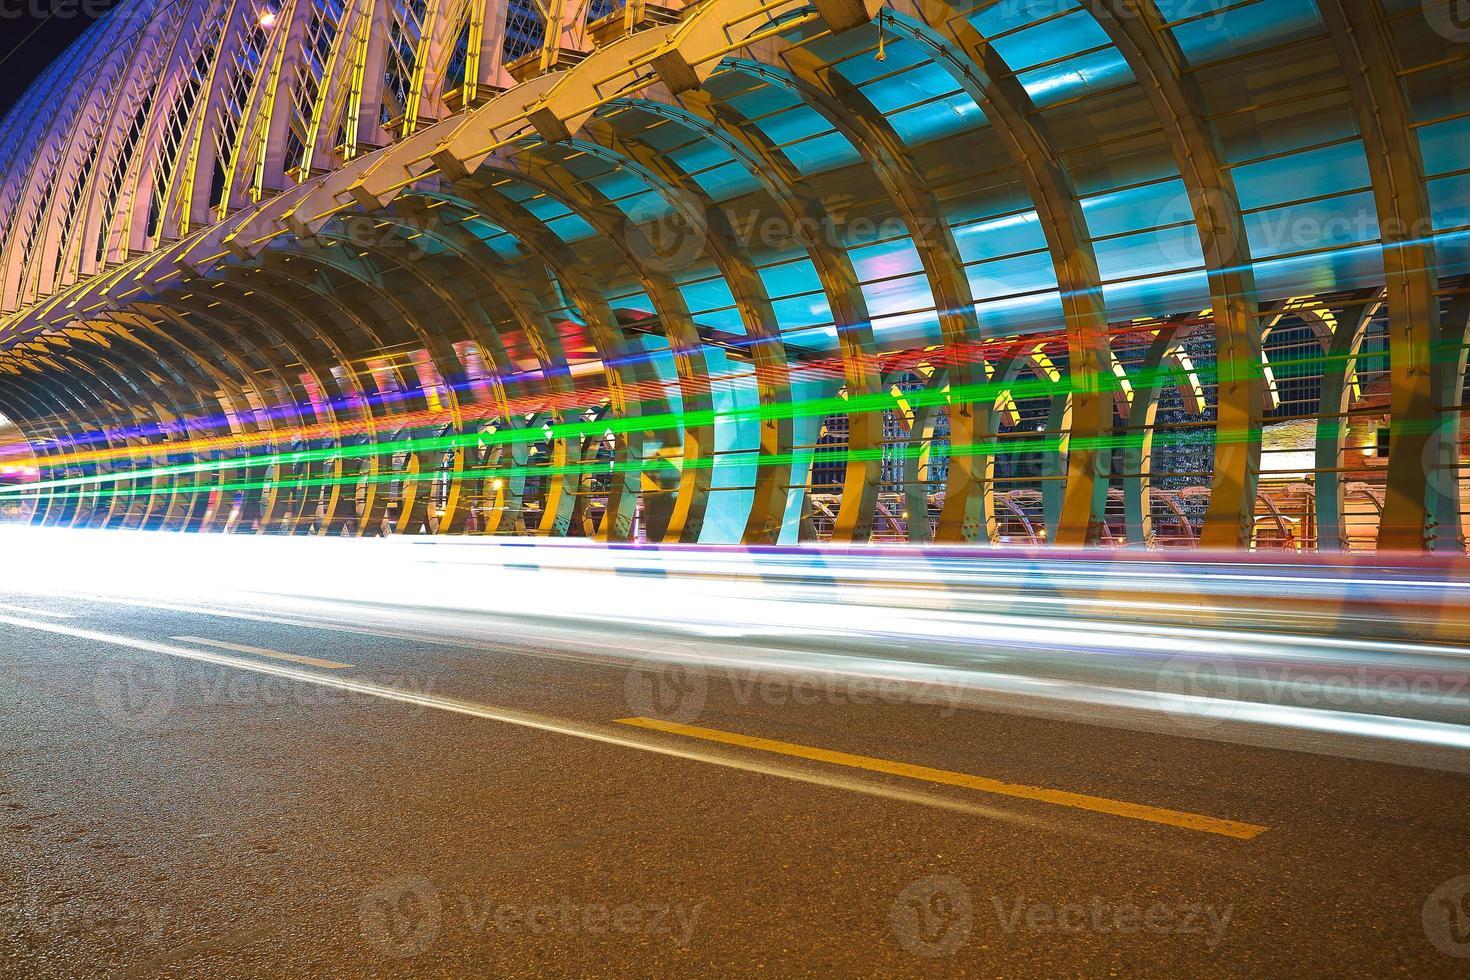 Stadtstraße Eisenbrücke der Nachtszene foto